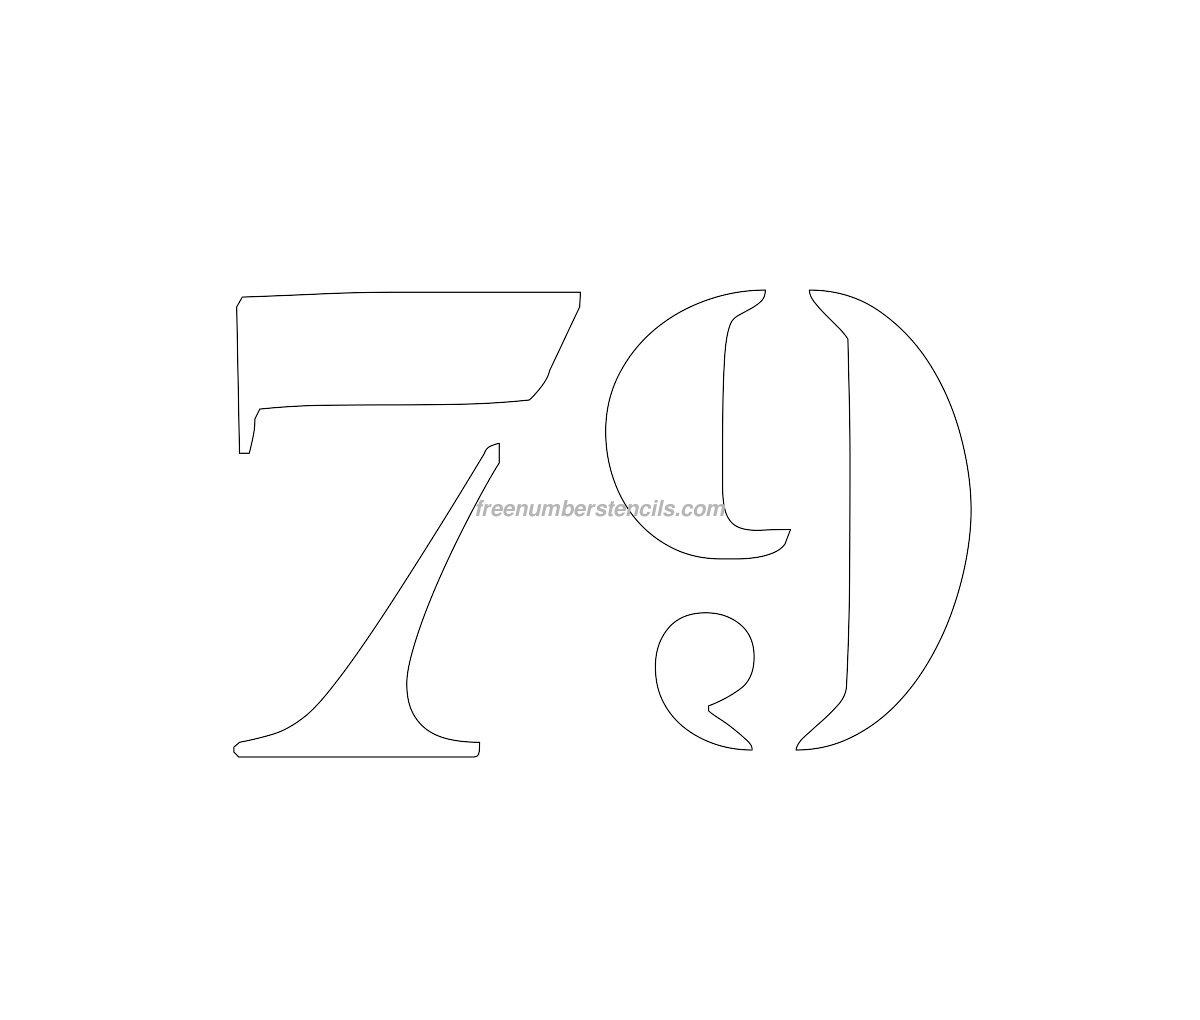 Free Curb Painting 79 Number Stencil Freenumberstencils Com